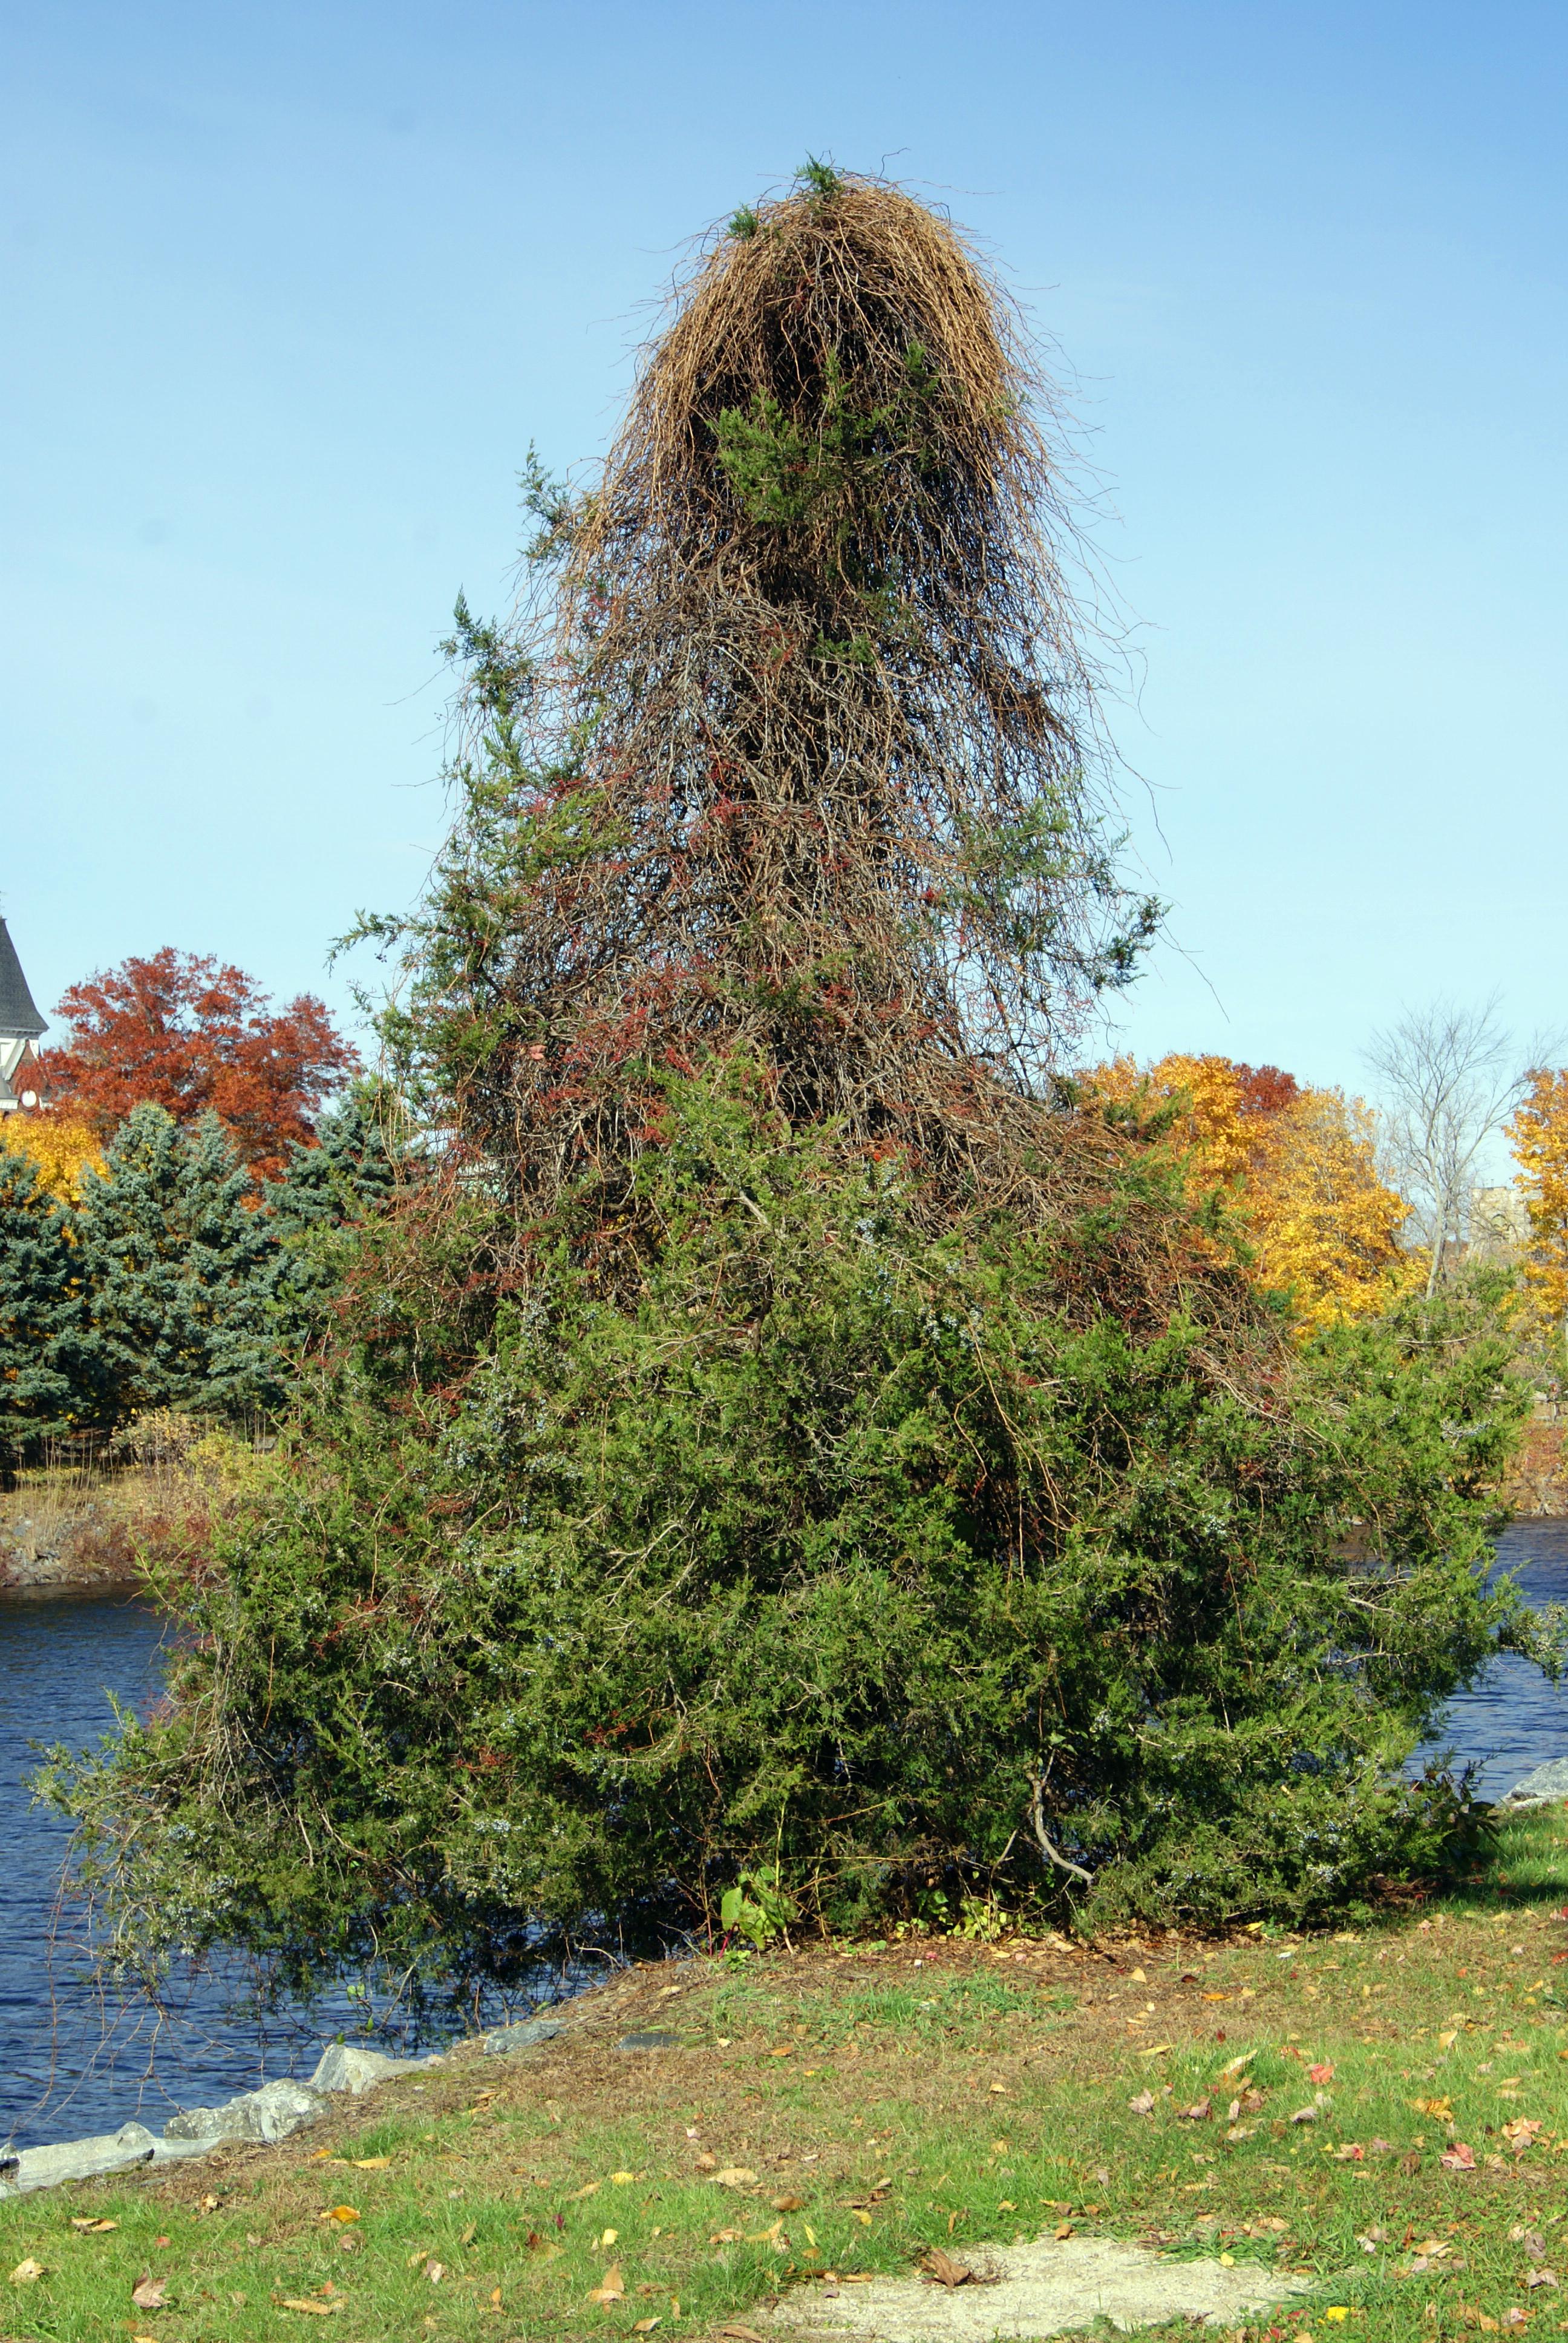 Wild looking tree photo